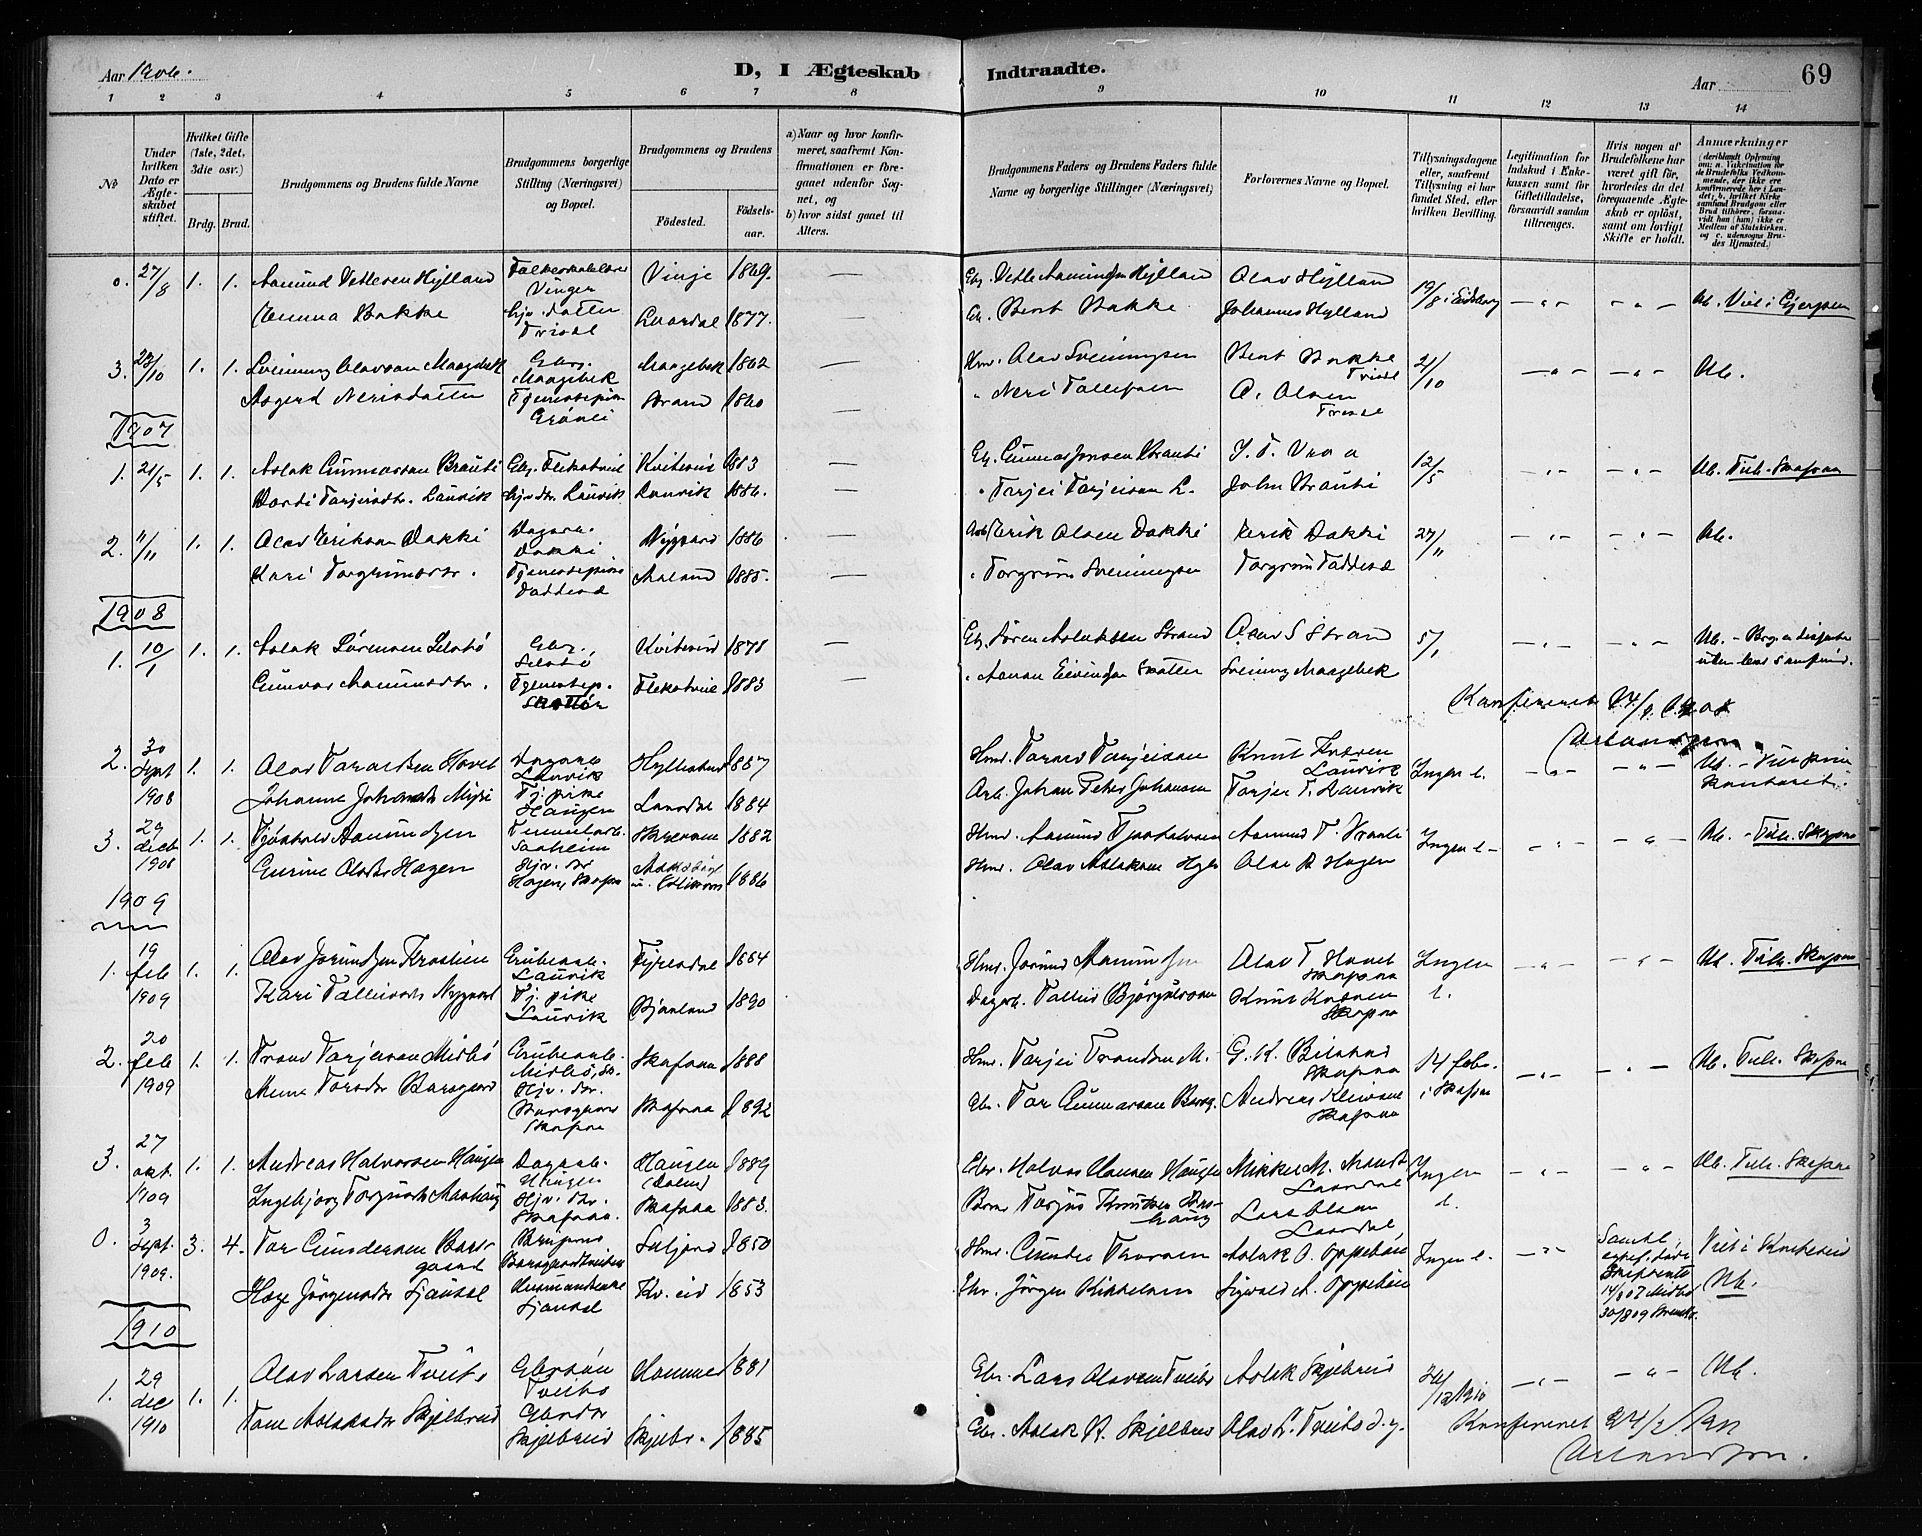 SAKO, Lårdal kirkebøker, G/Ga/L0003: Klokkerbok nr. I 3, 1891-1918, s. 69